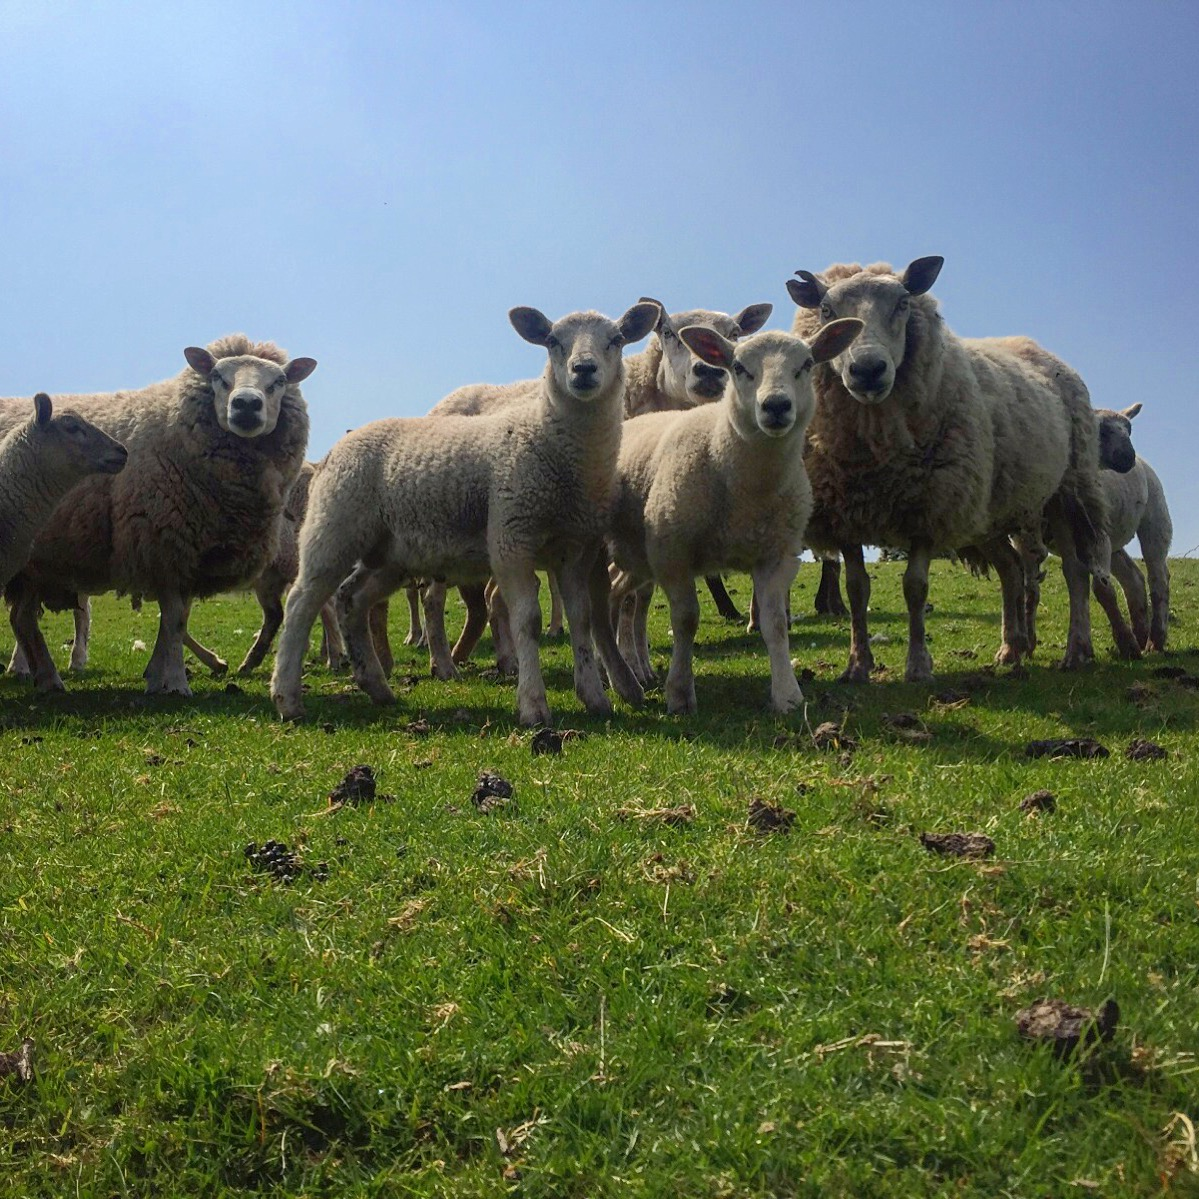 sheep_kilkeel_road_silent_valley_spelga_damn_mourne_mountains_ni_explorer_niexplorer_northern_ireland_blog.jpg